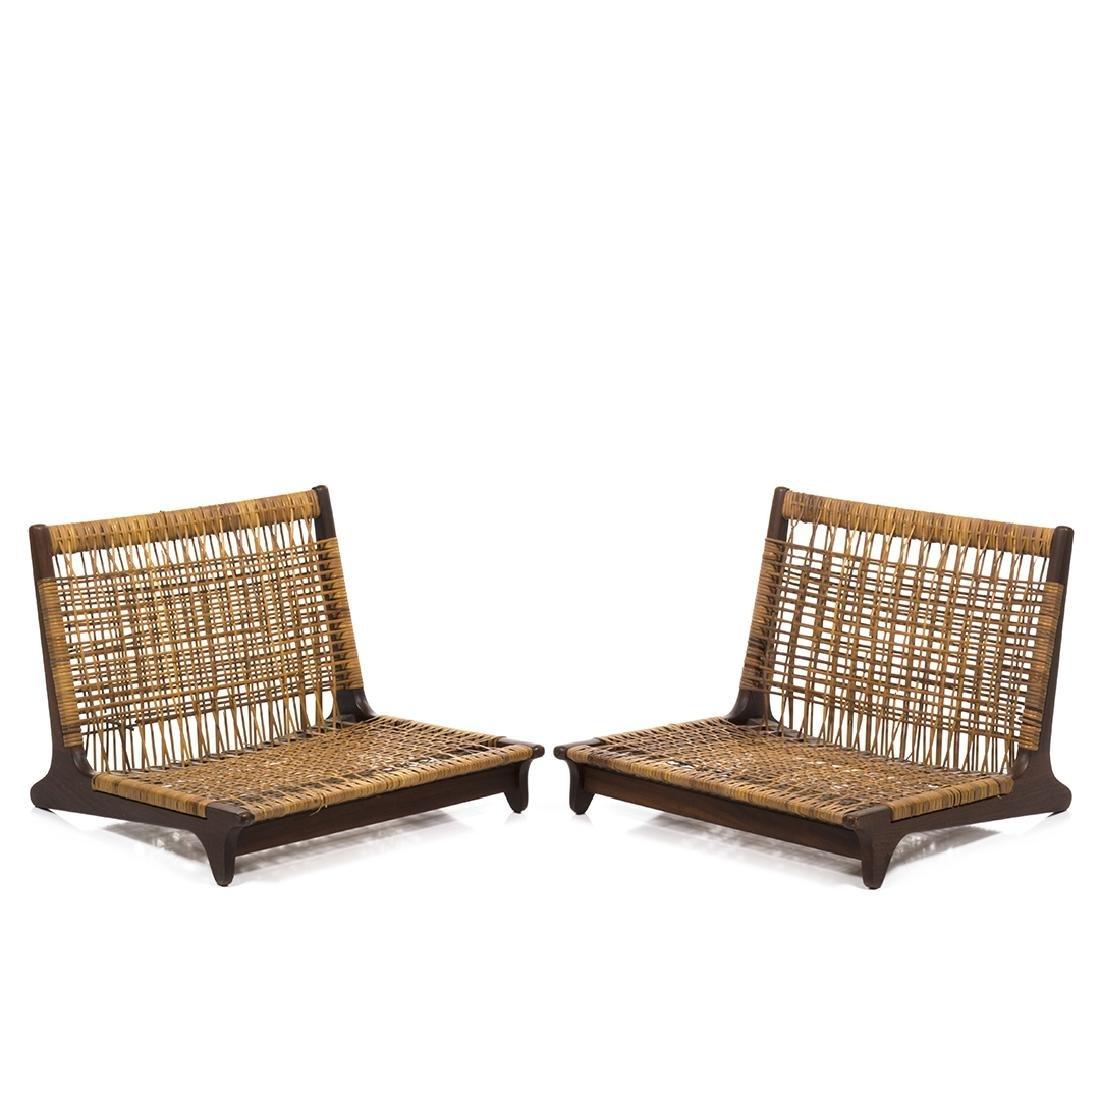 Hans Olsen Modular Seats (2)